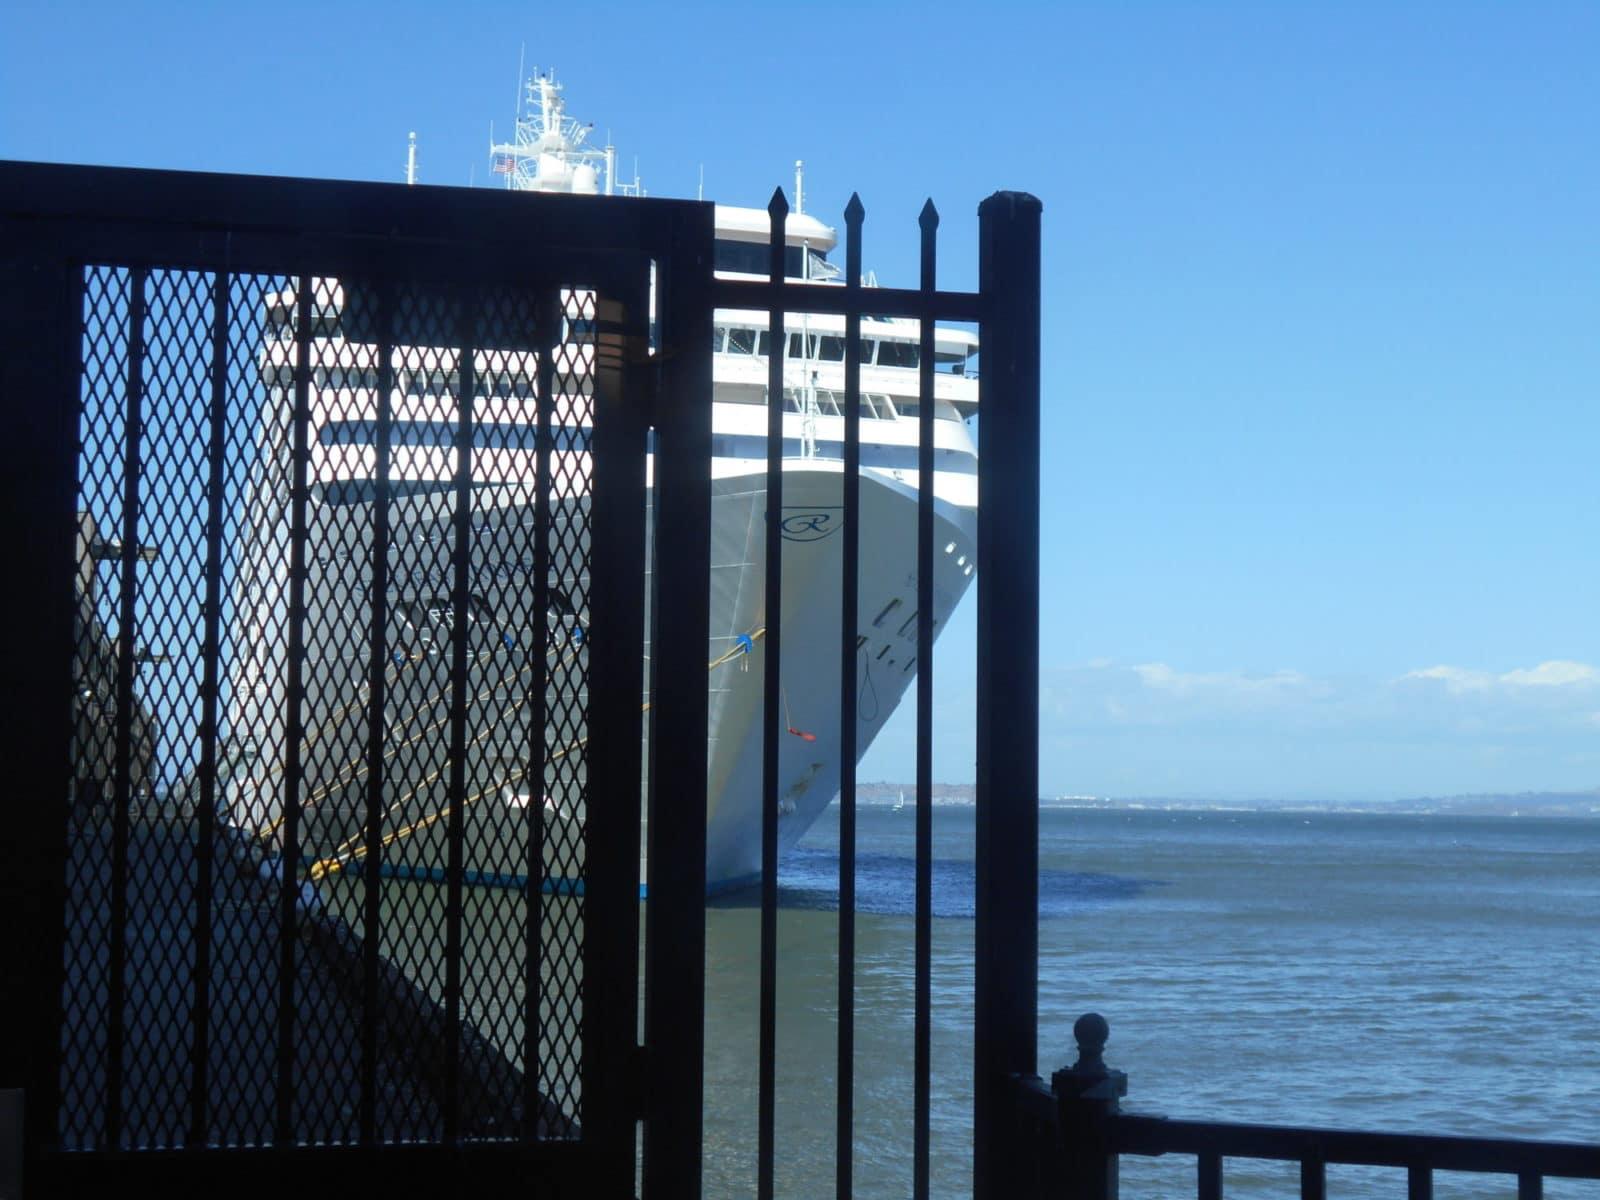 Mariner docked in San Francisco